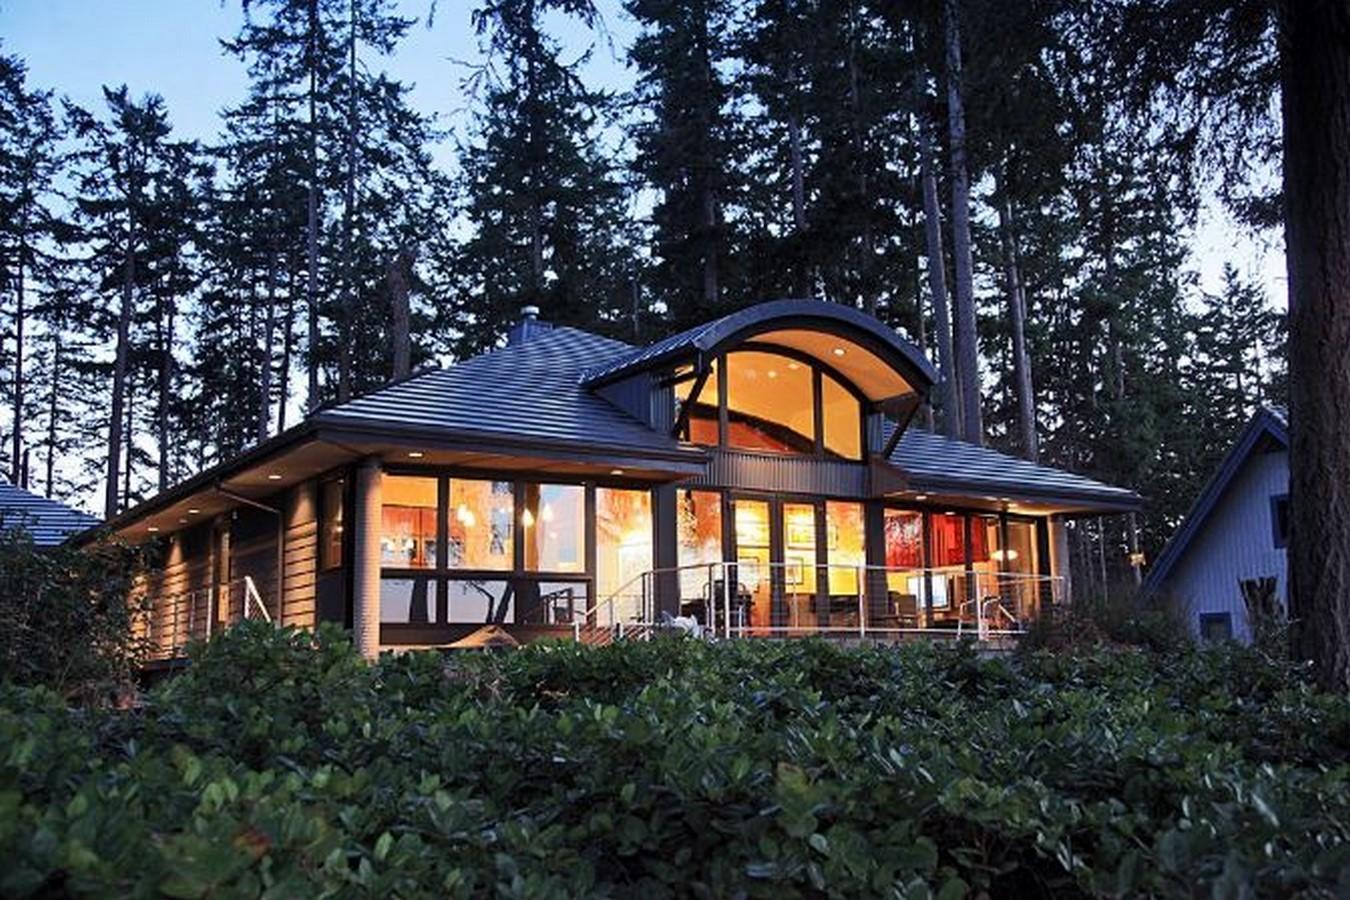 Architects in Tacoma - Top 30 Architects in Tacoma - Sheet12